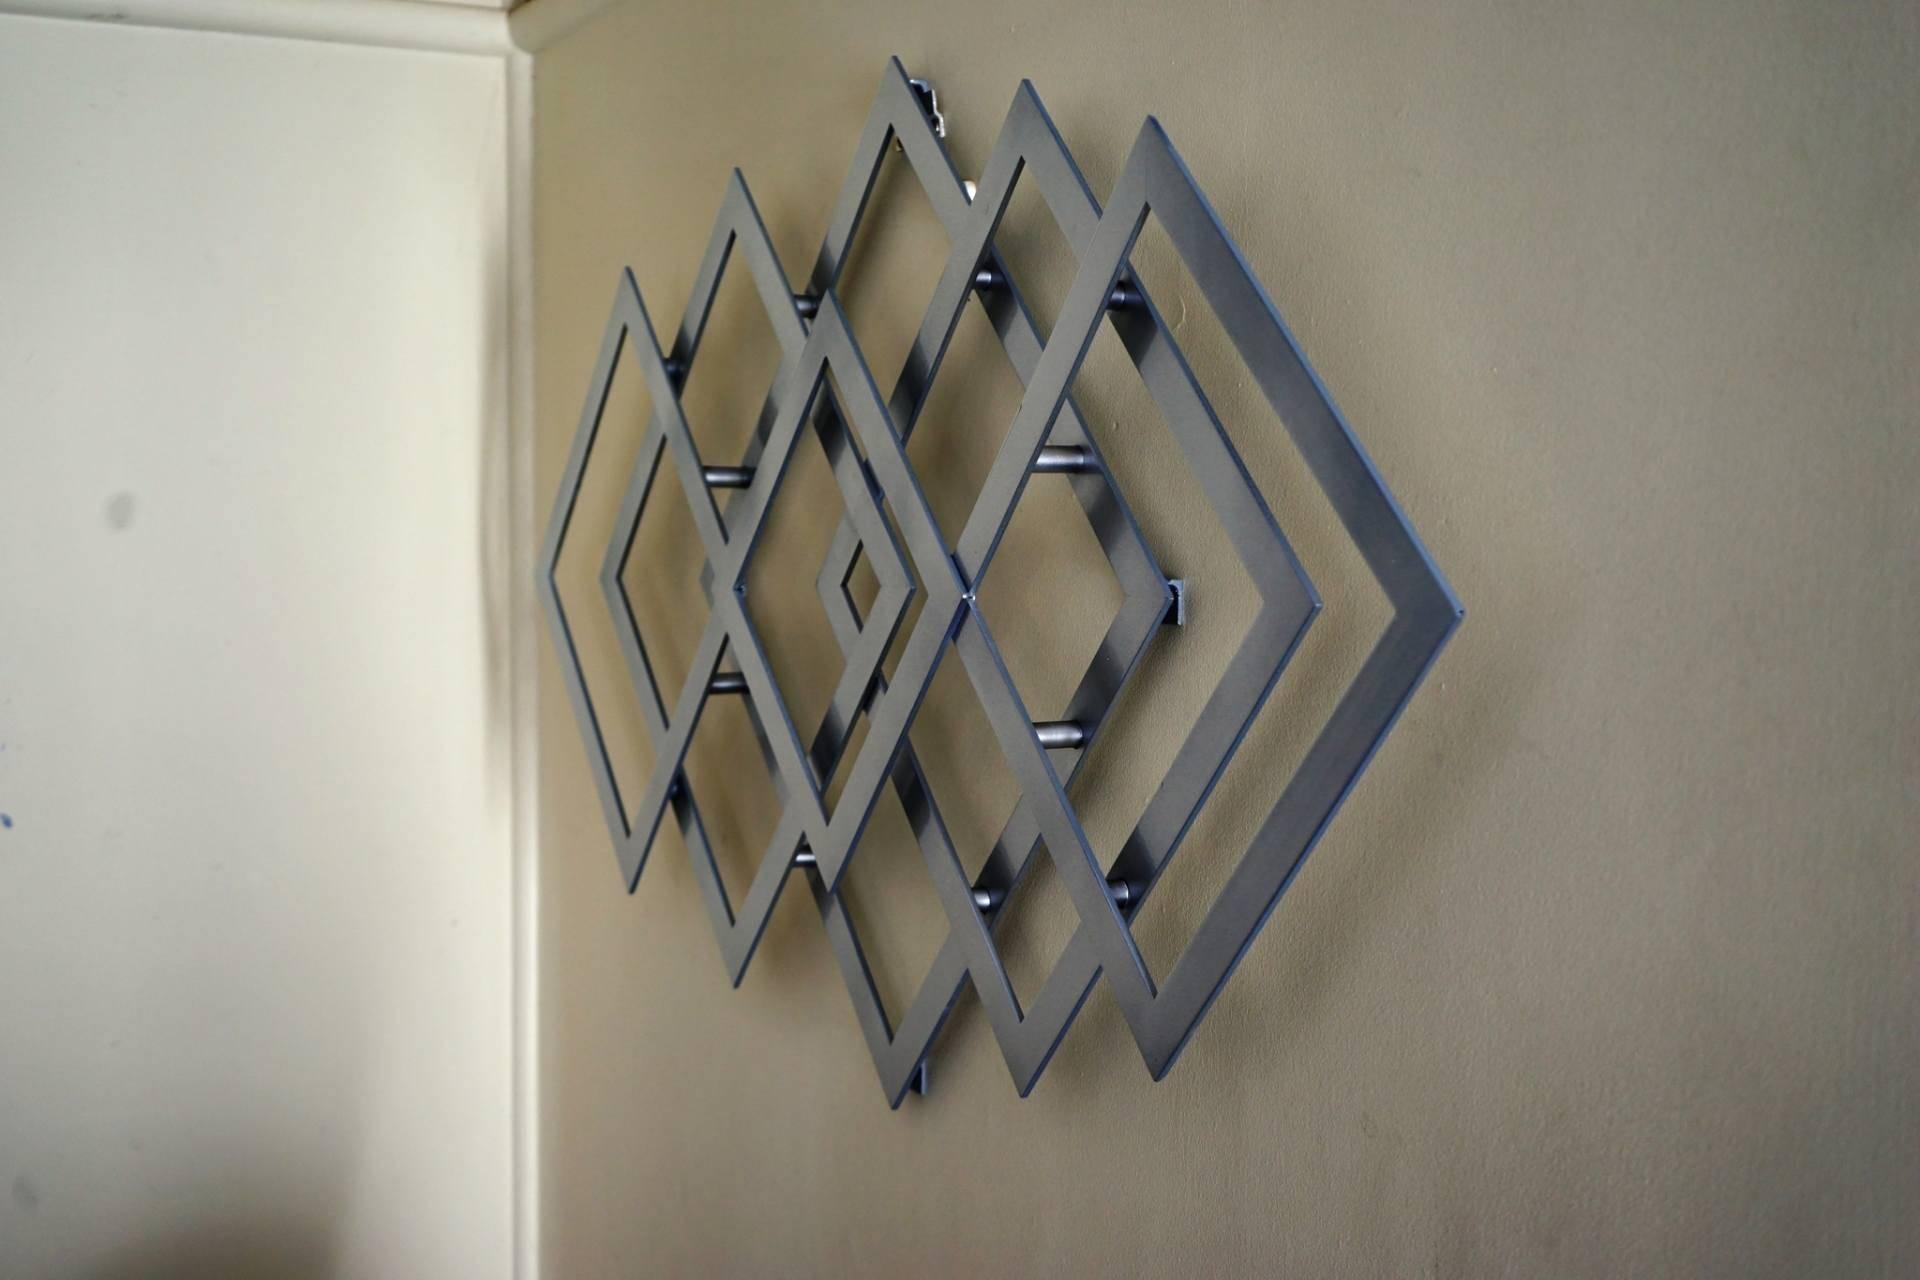 Saatchi Art: Geometric Metal Wall Art Sculpturealdo Milin In Latest Geometric Metal Wall Art (View 14 of 20)